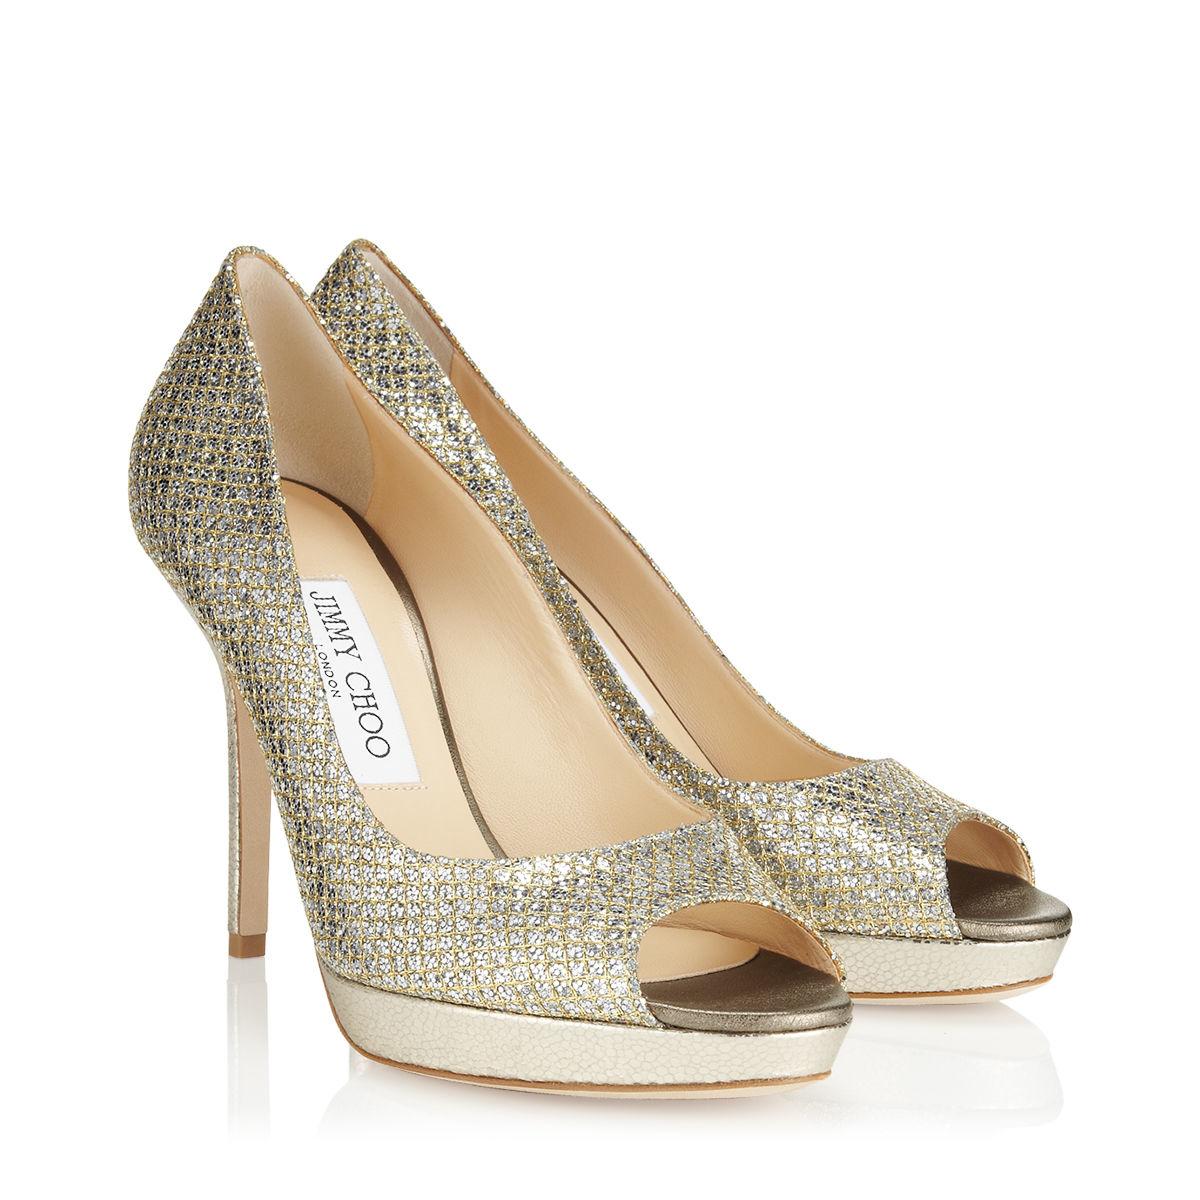 0414aa34238 Jimmy Choo Luna Champagne Glitter Fabric Platform Peep Toe Pumps in  Metallic - Lyst